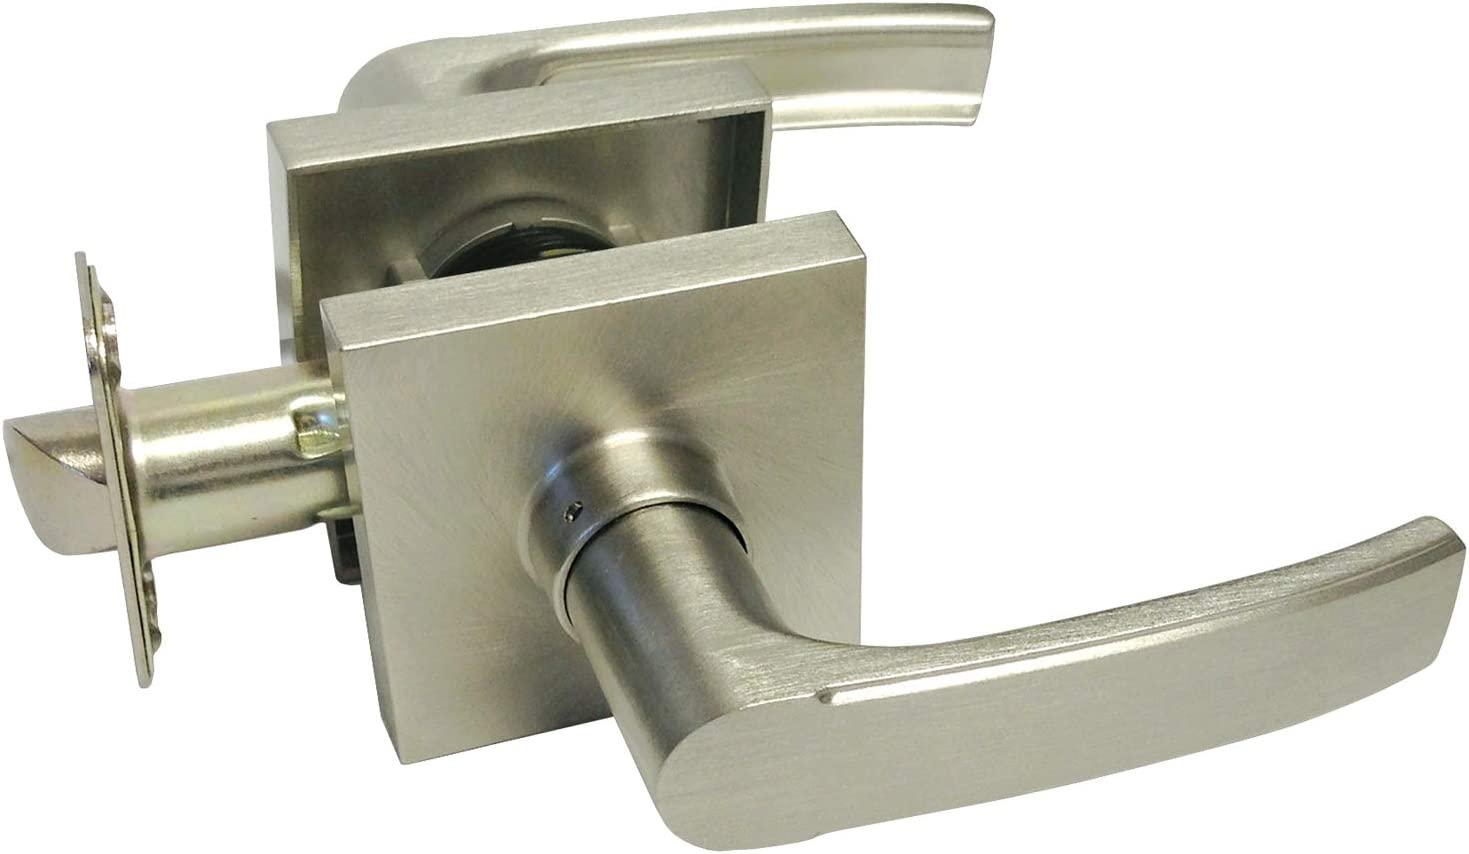 Passage Satin Nickel Brushed Nickel Square Plate Door Locks Closet Round Knobs